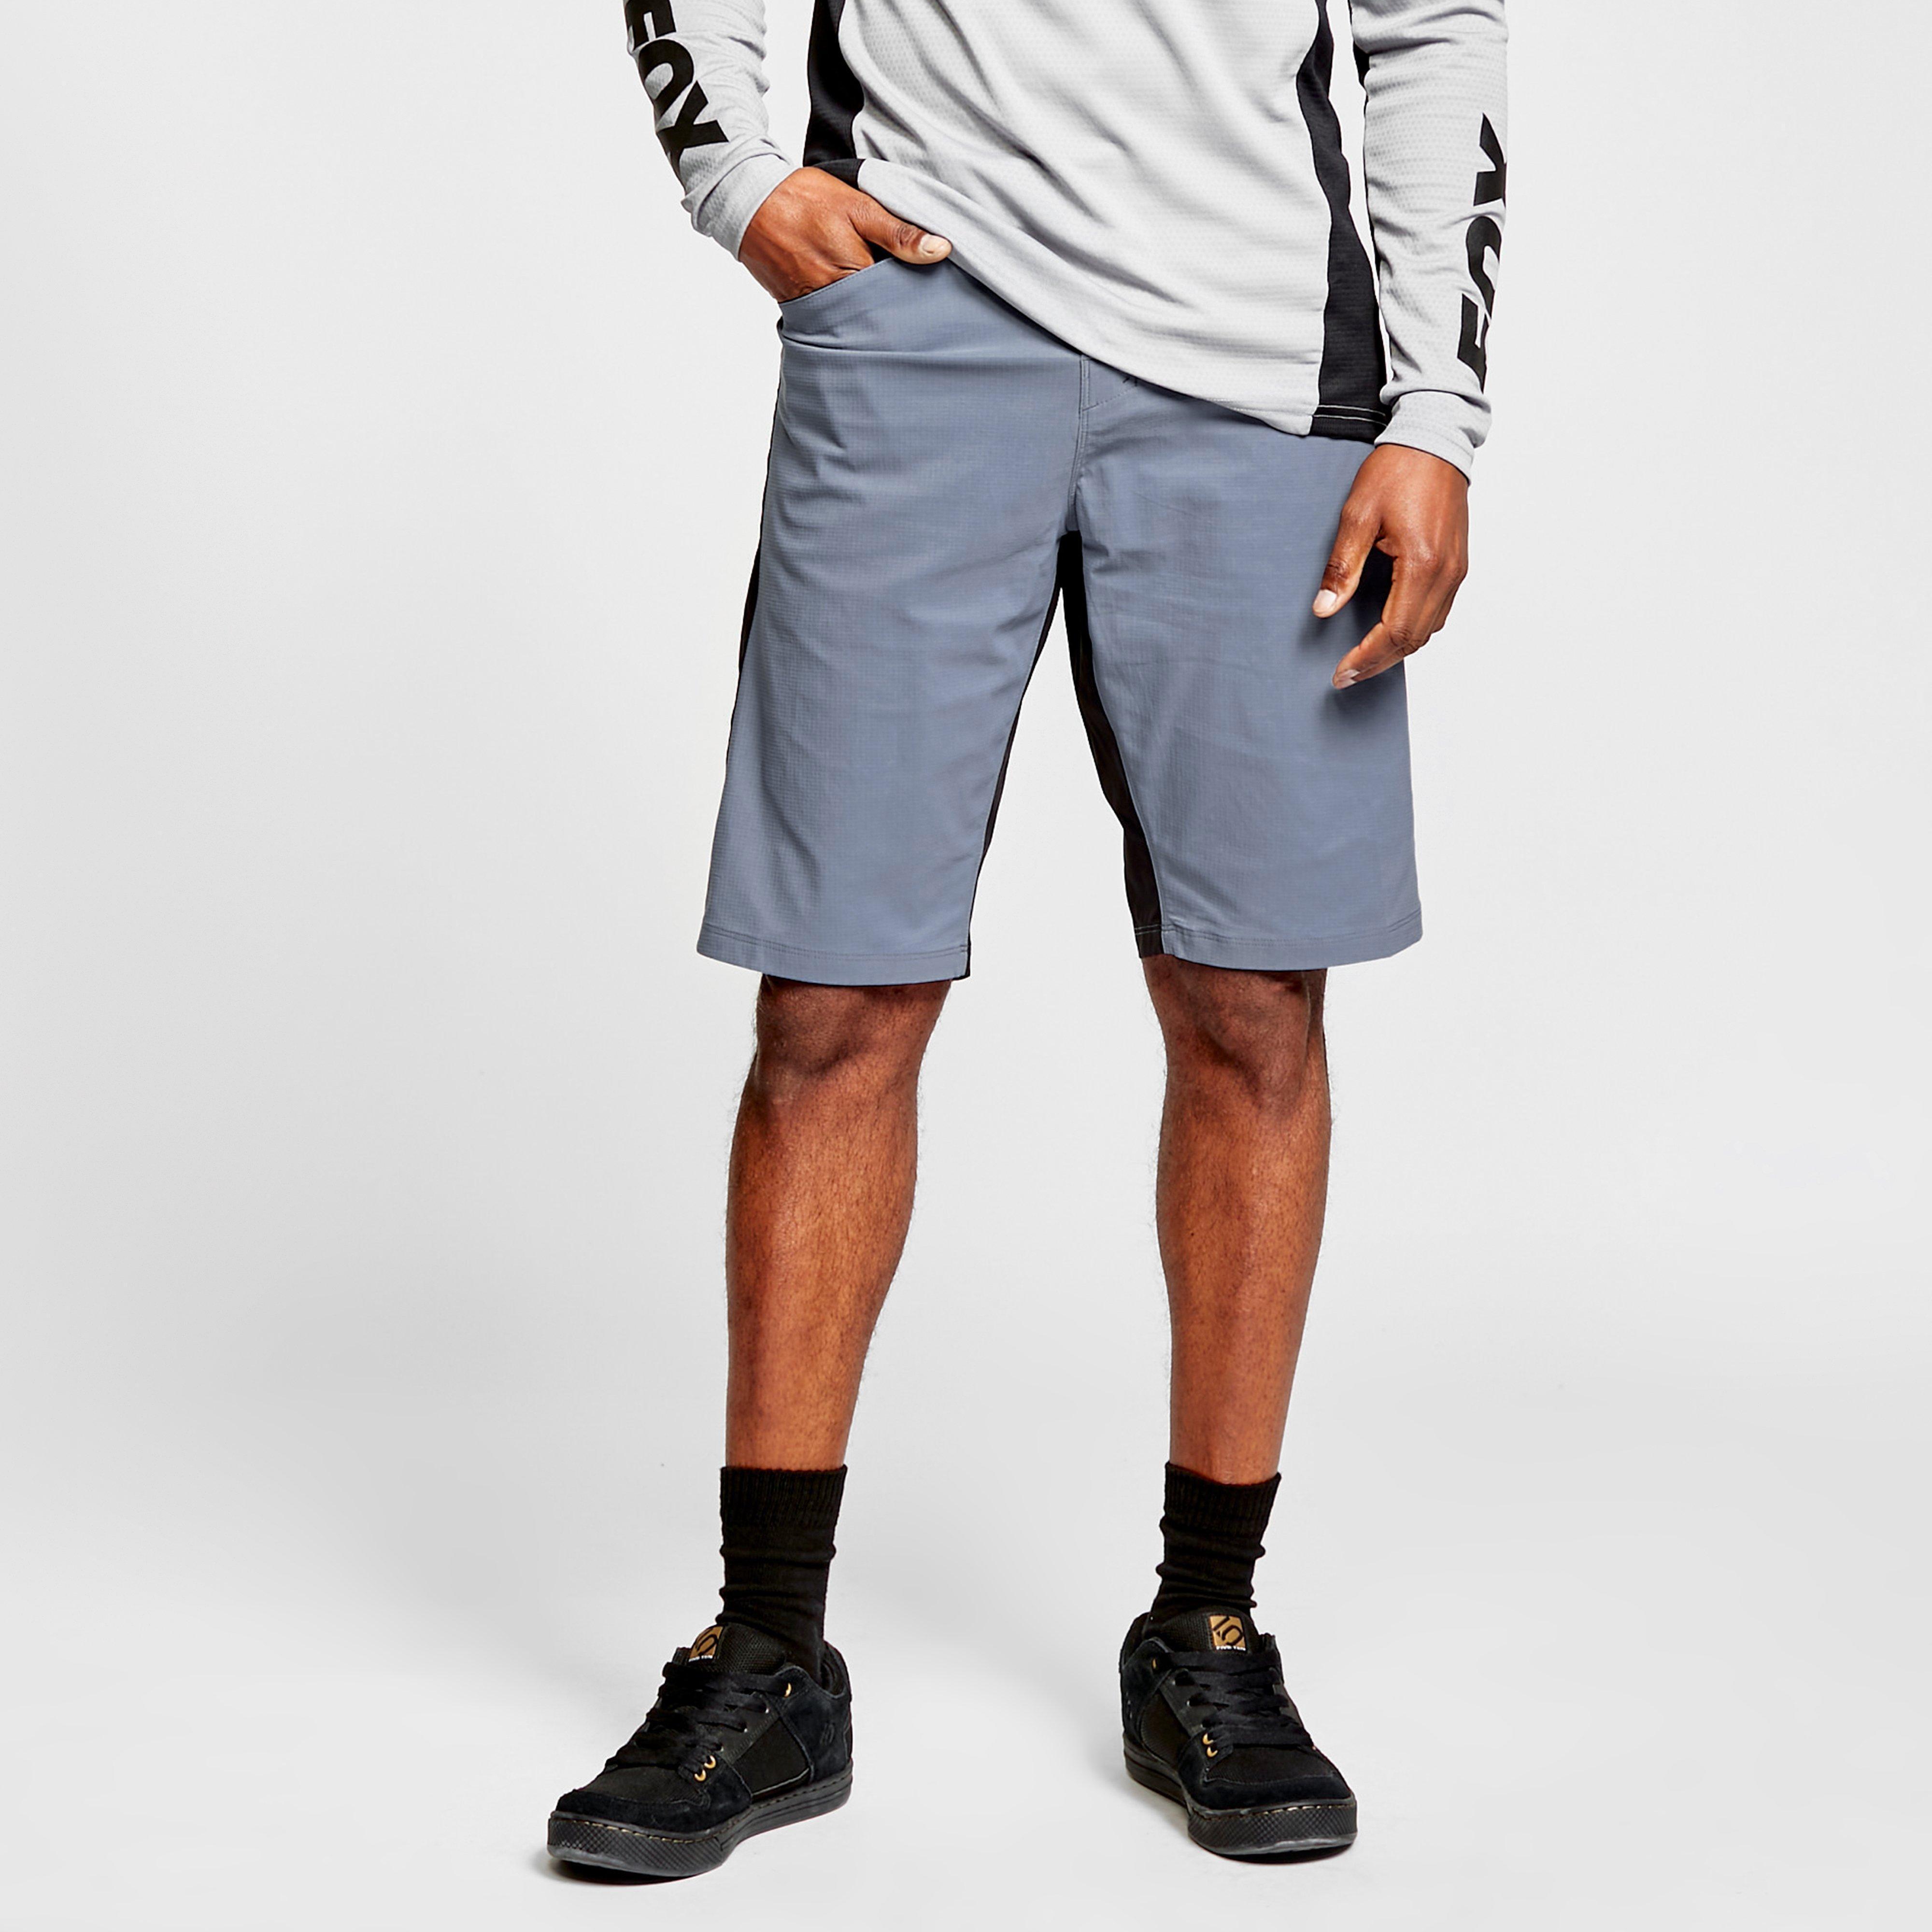 Fox Men's Ranger Water Resistant Shorts - Blue/Blue, Blue